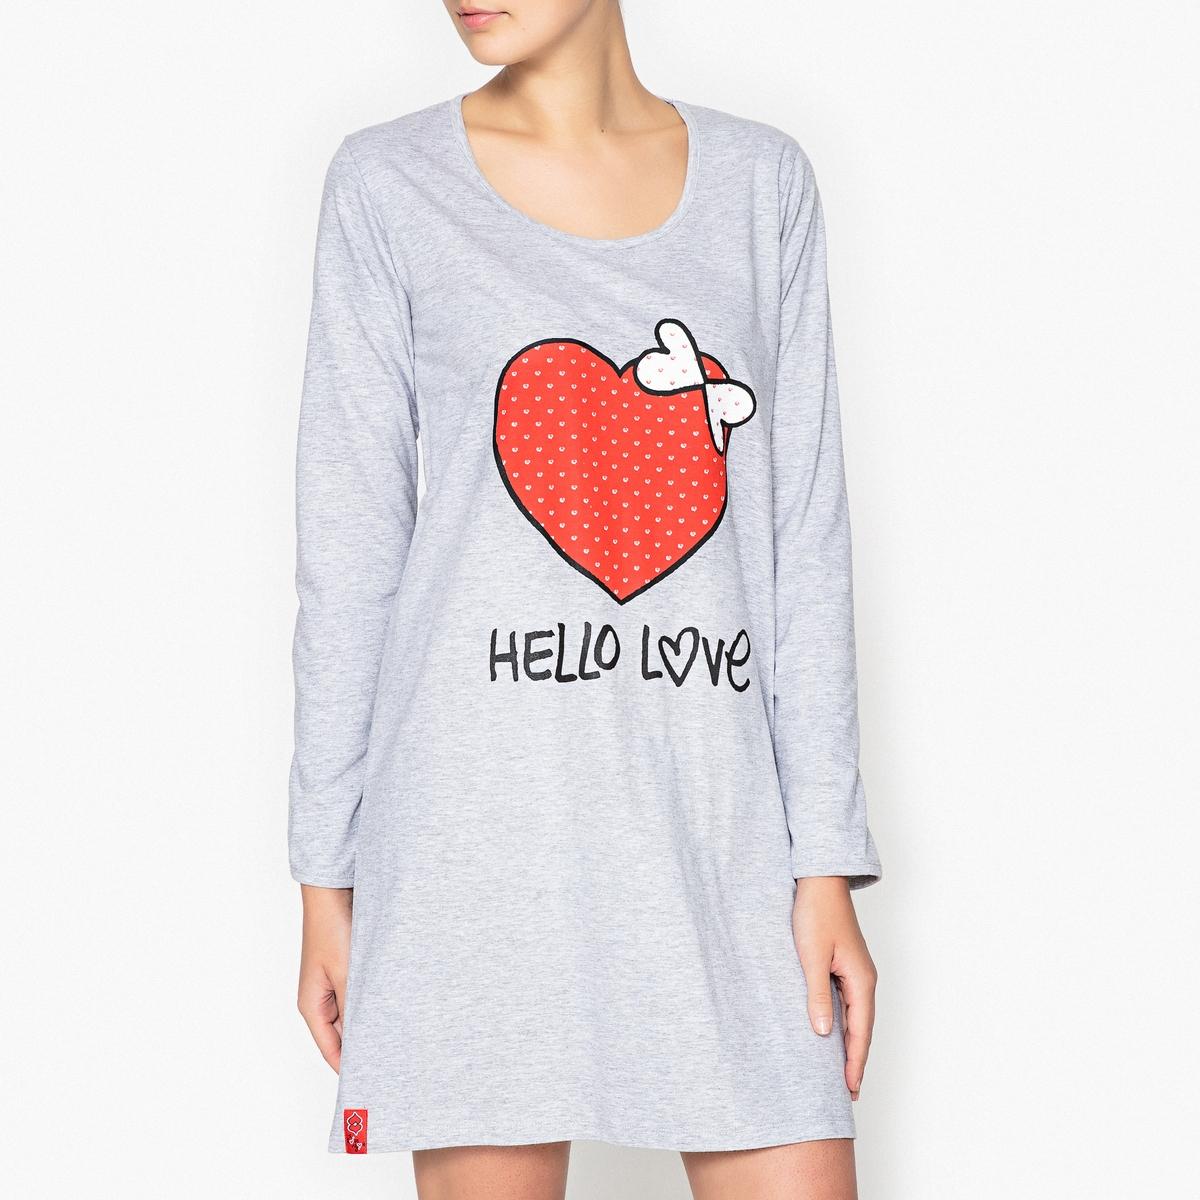 Ночная рубашка с принтом, Lovelies